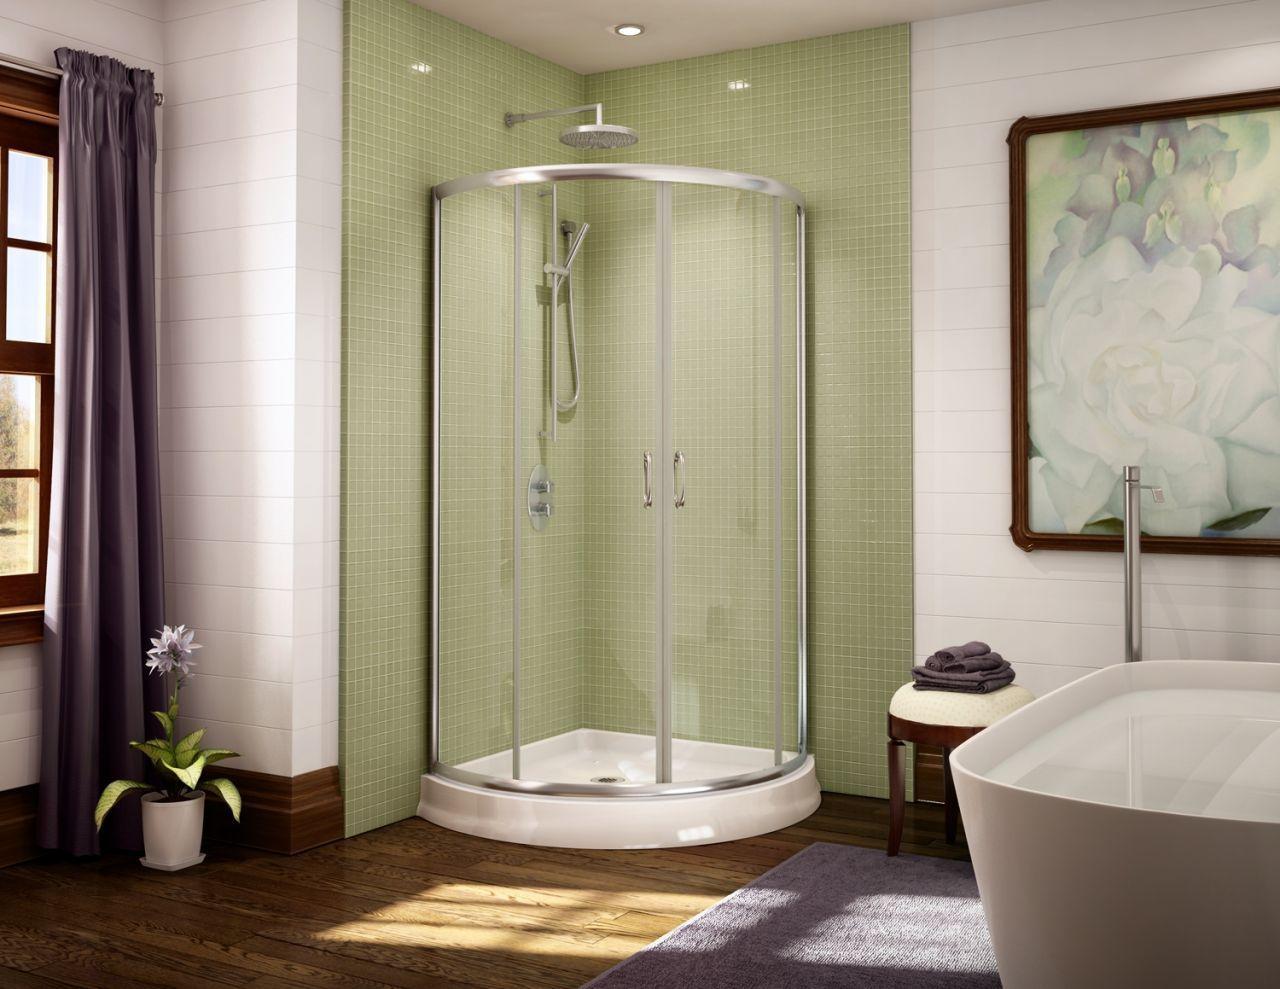 Shabby chic blue shower tile design ideas for your bathroom 07